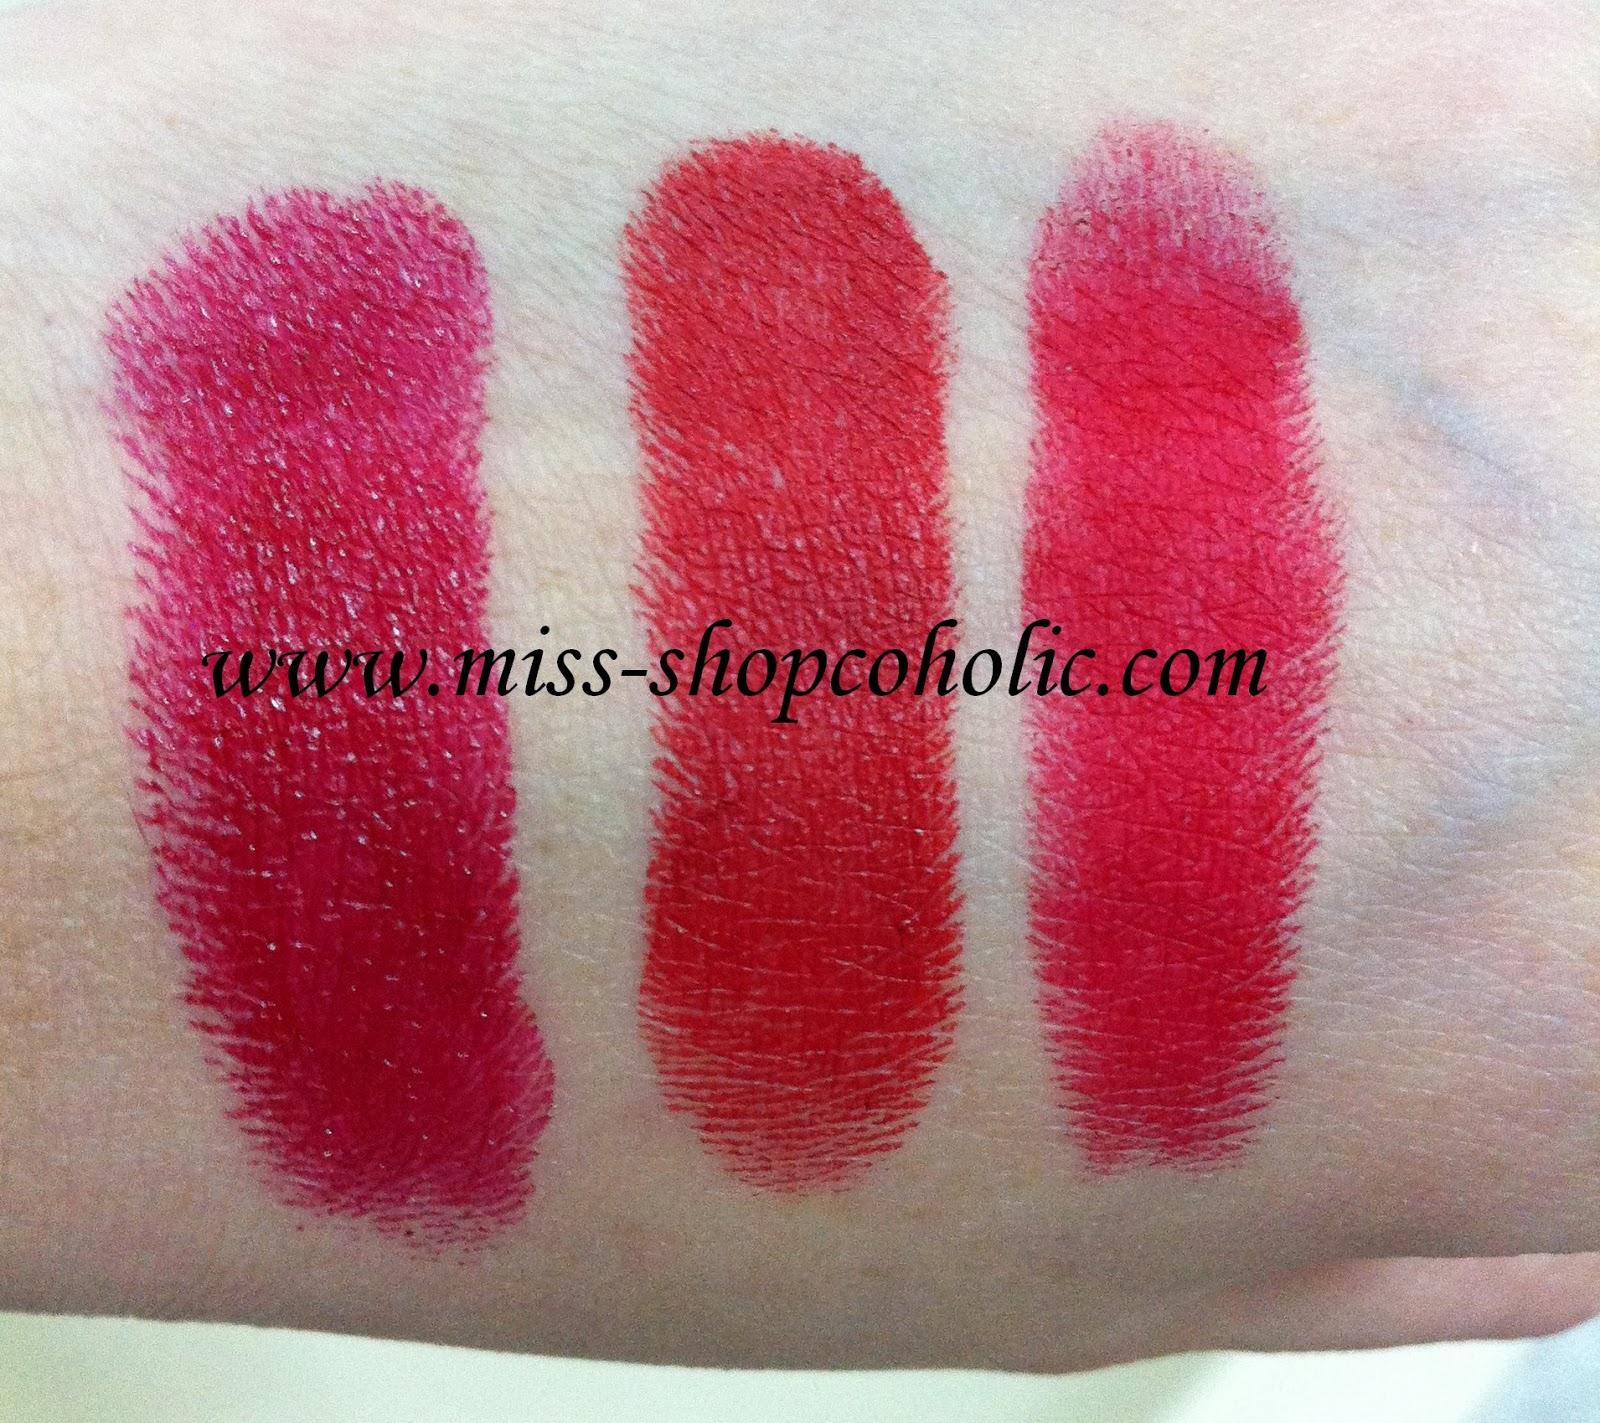 Bobbi Brown Red Carpet Lipstick Swatch | The Art Of Beauty